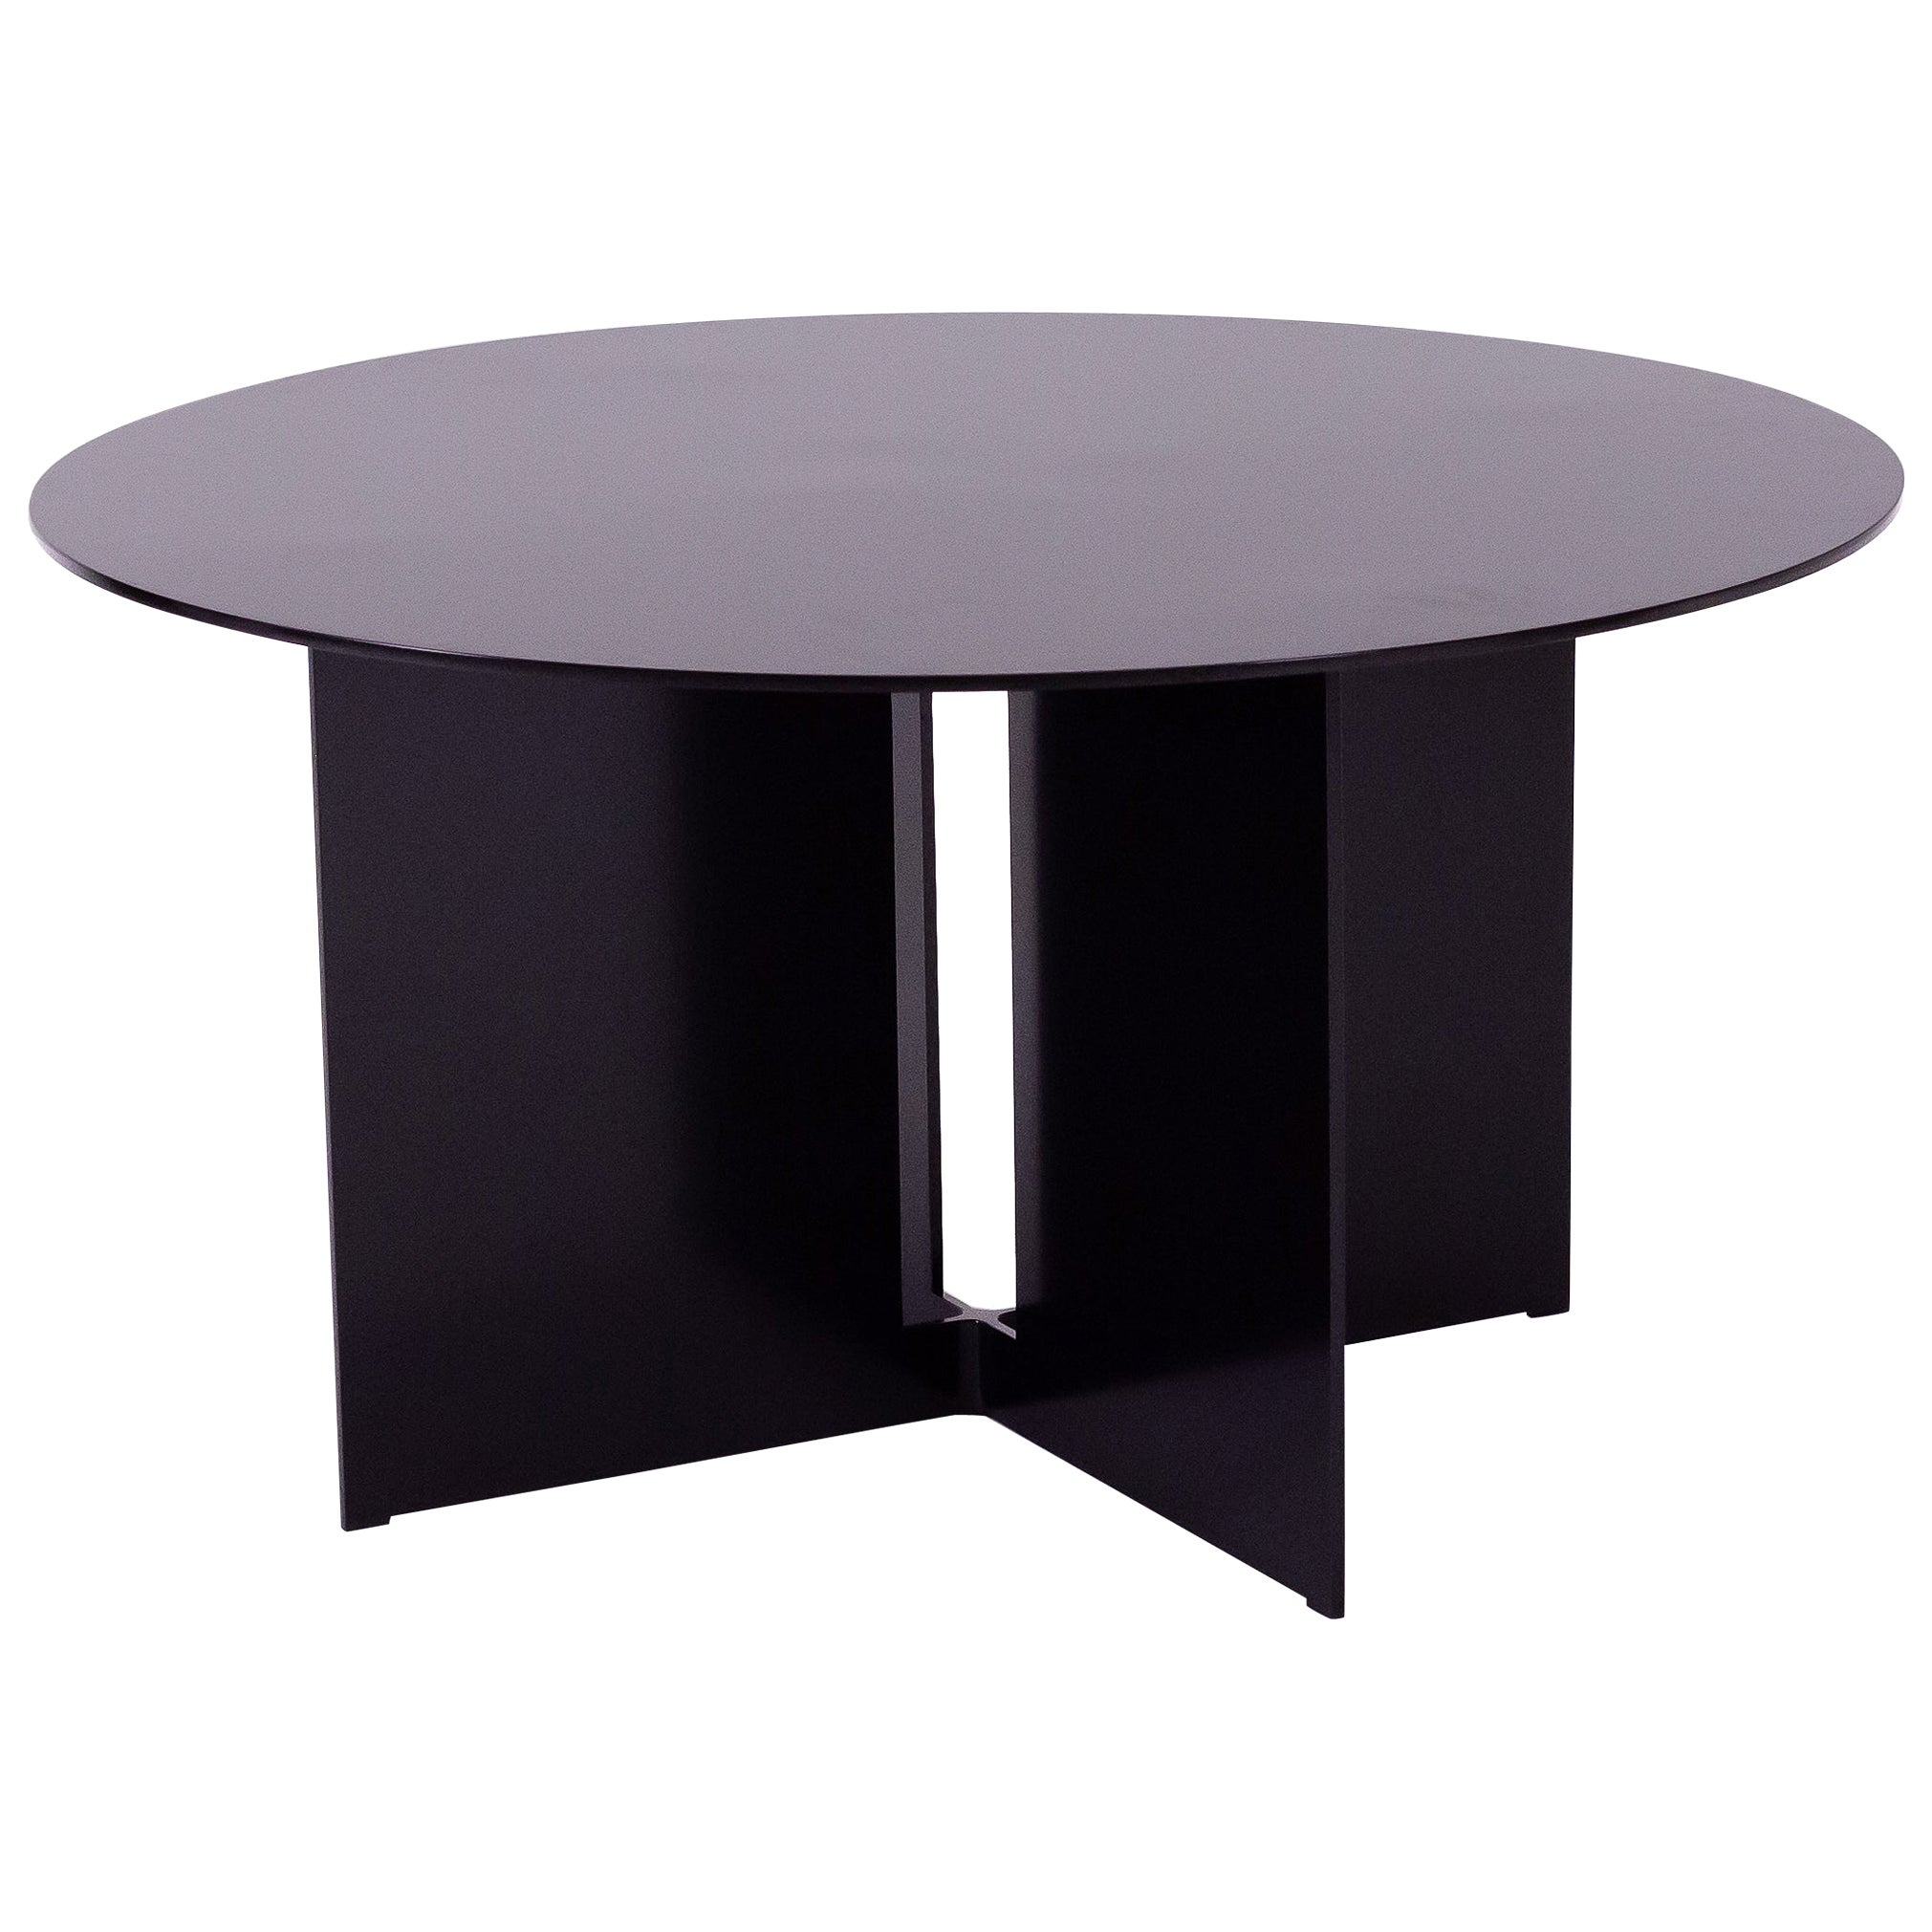 Mers Coffee Table in Aluminum Powdercoat Black